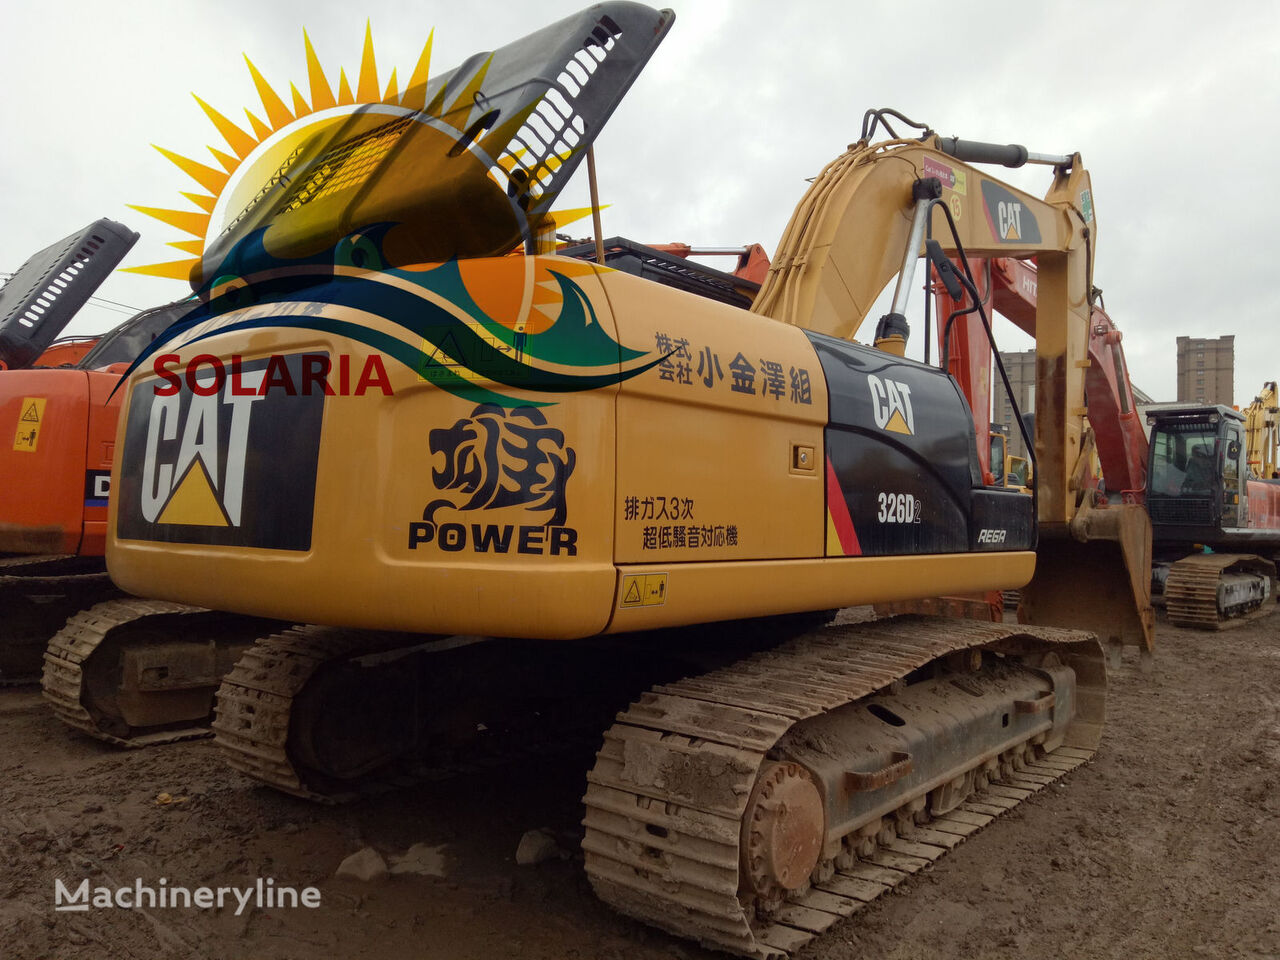 CATERPILLAR 326D excavadora de orugas